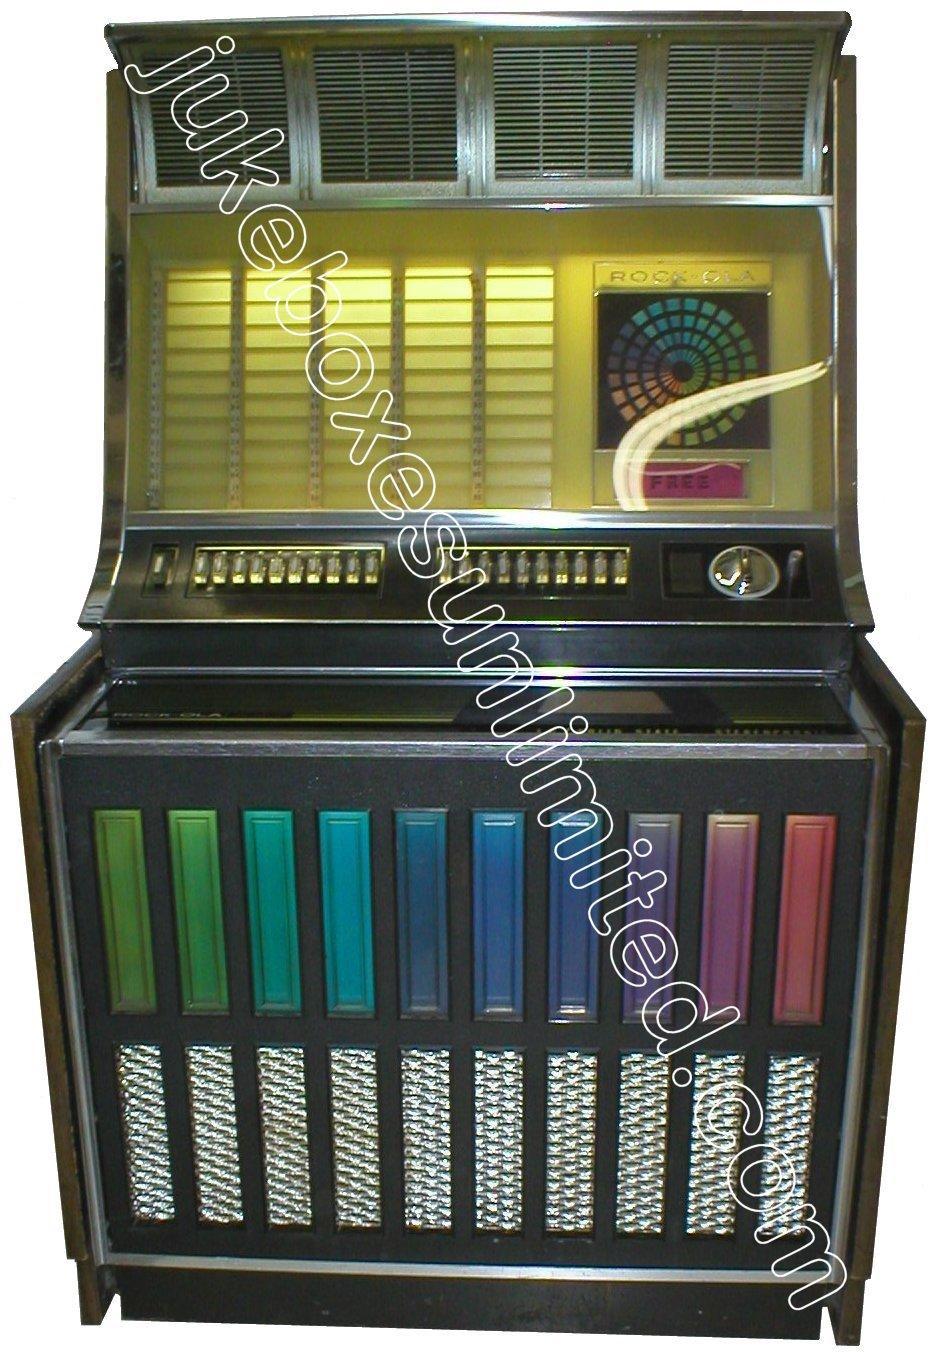 Rockola Jukebox Values 1970 Rockola 443 Jukebox For